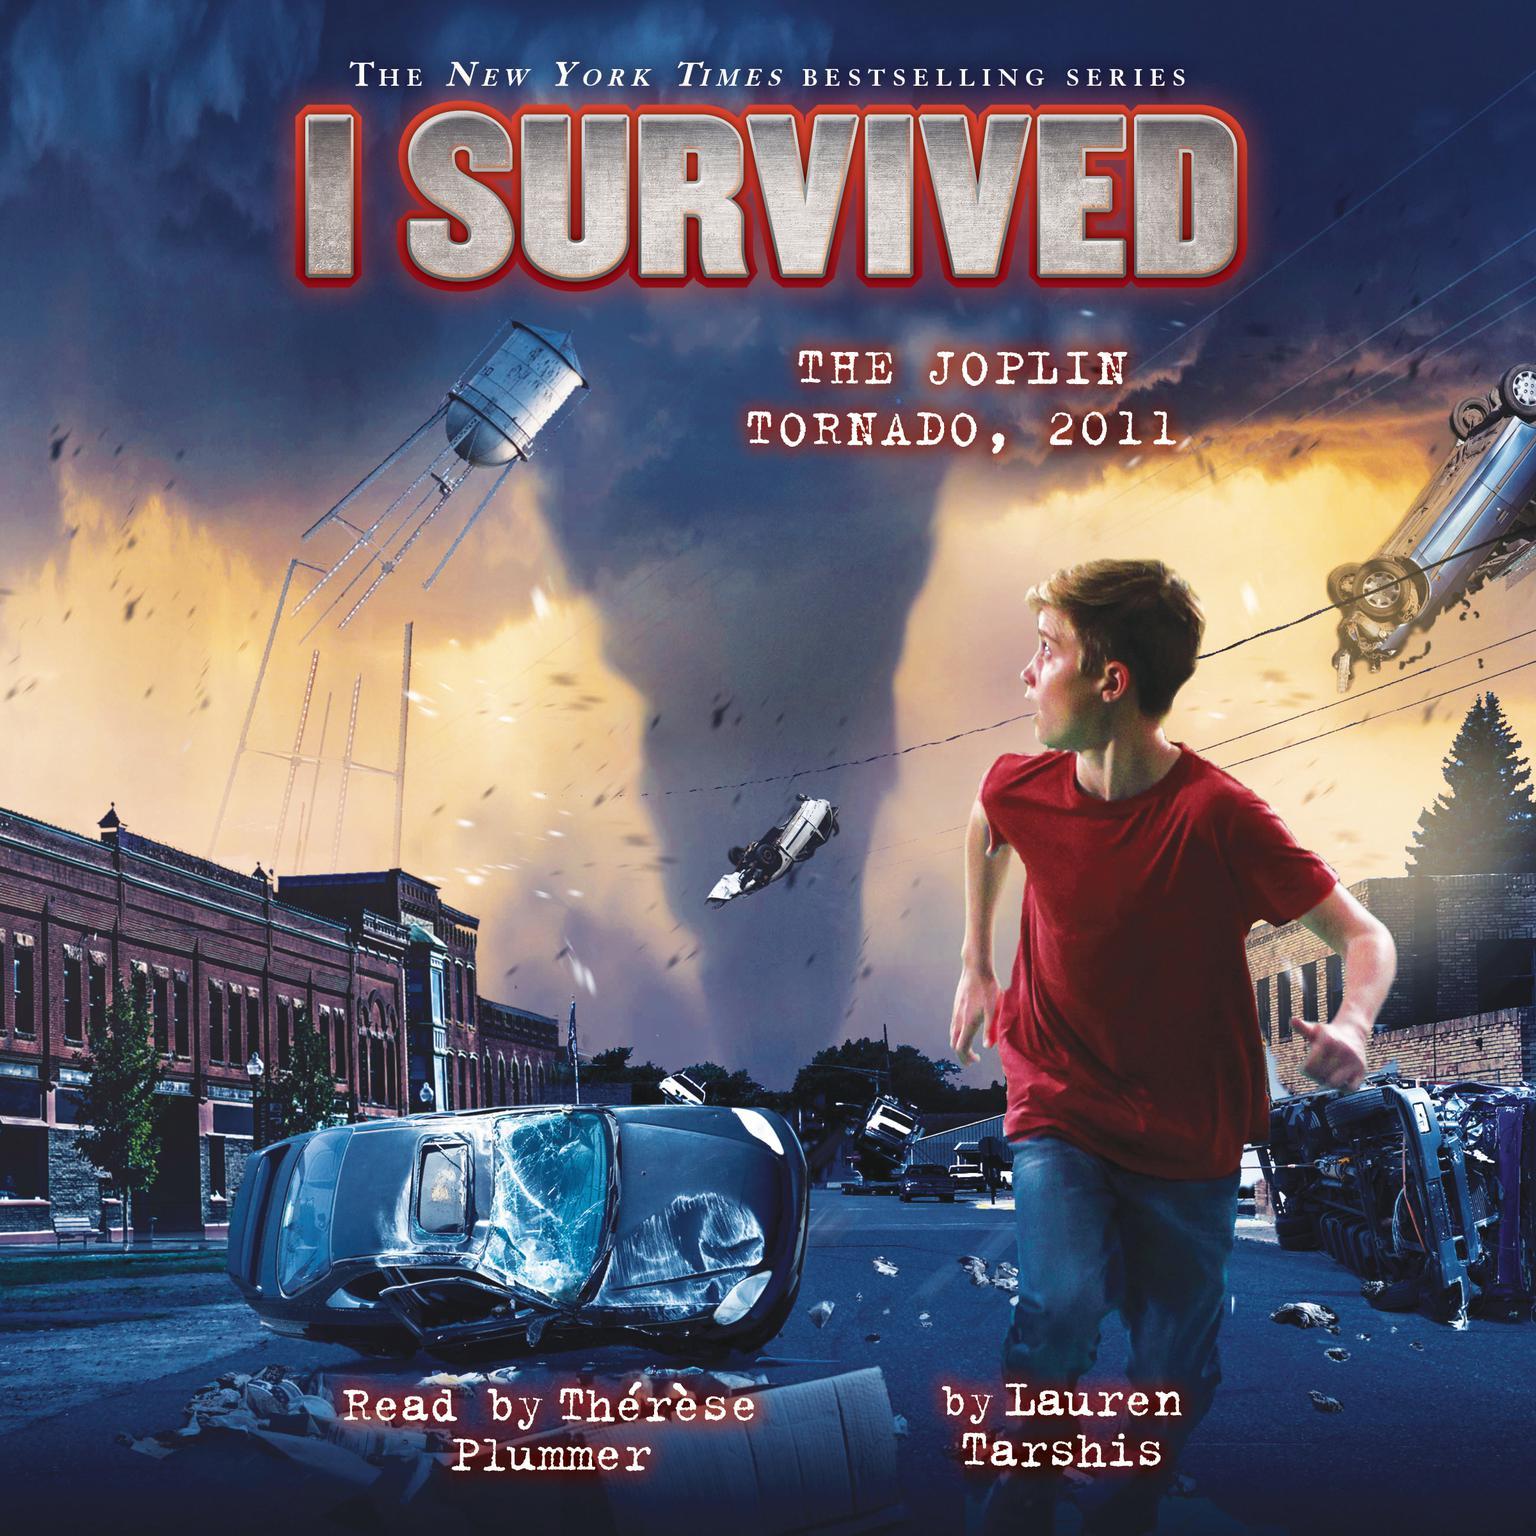 I Survived the Joplin Tornado, 2011 Audiobook, by Lauren Tarshis